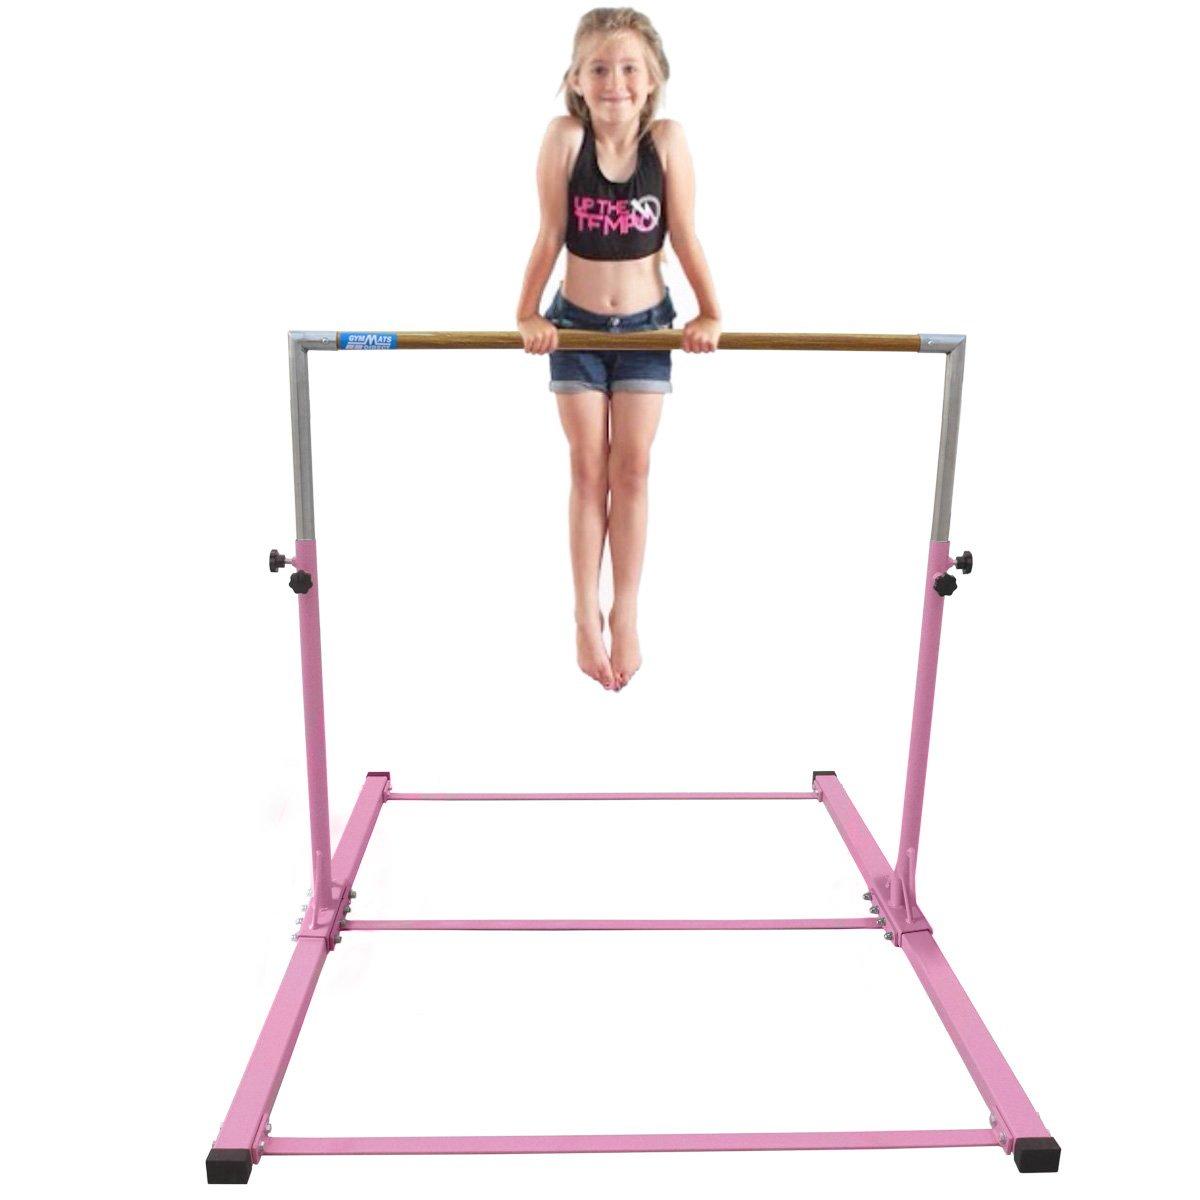 Gymmatsdirect Gymnastics Junior Training Bar - Adjustable Horizontal Kip Bar for Kids 4.2' Wide 6' Long 36''-59'' High, Pink